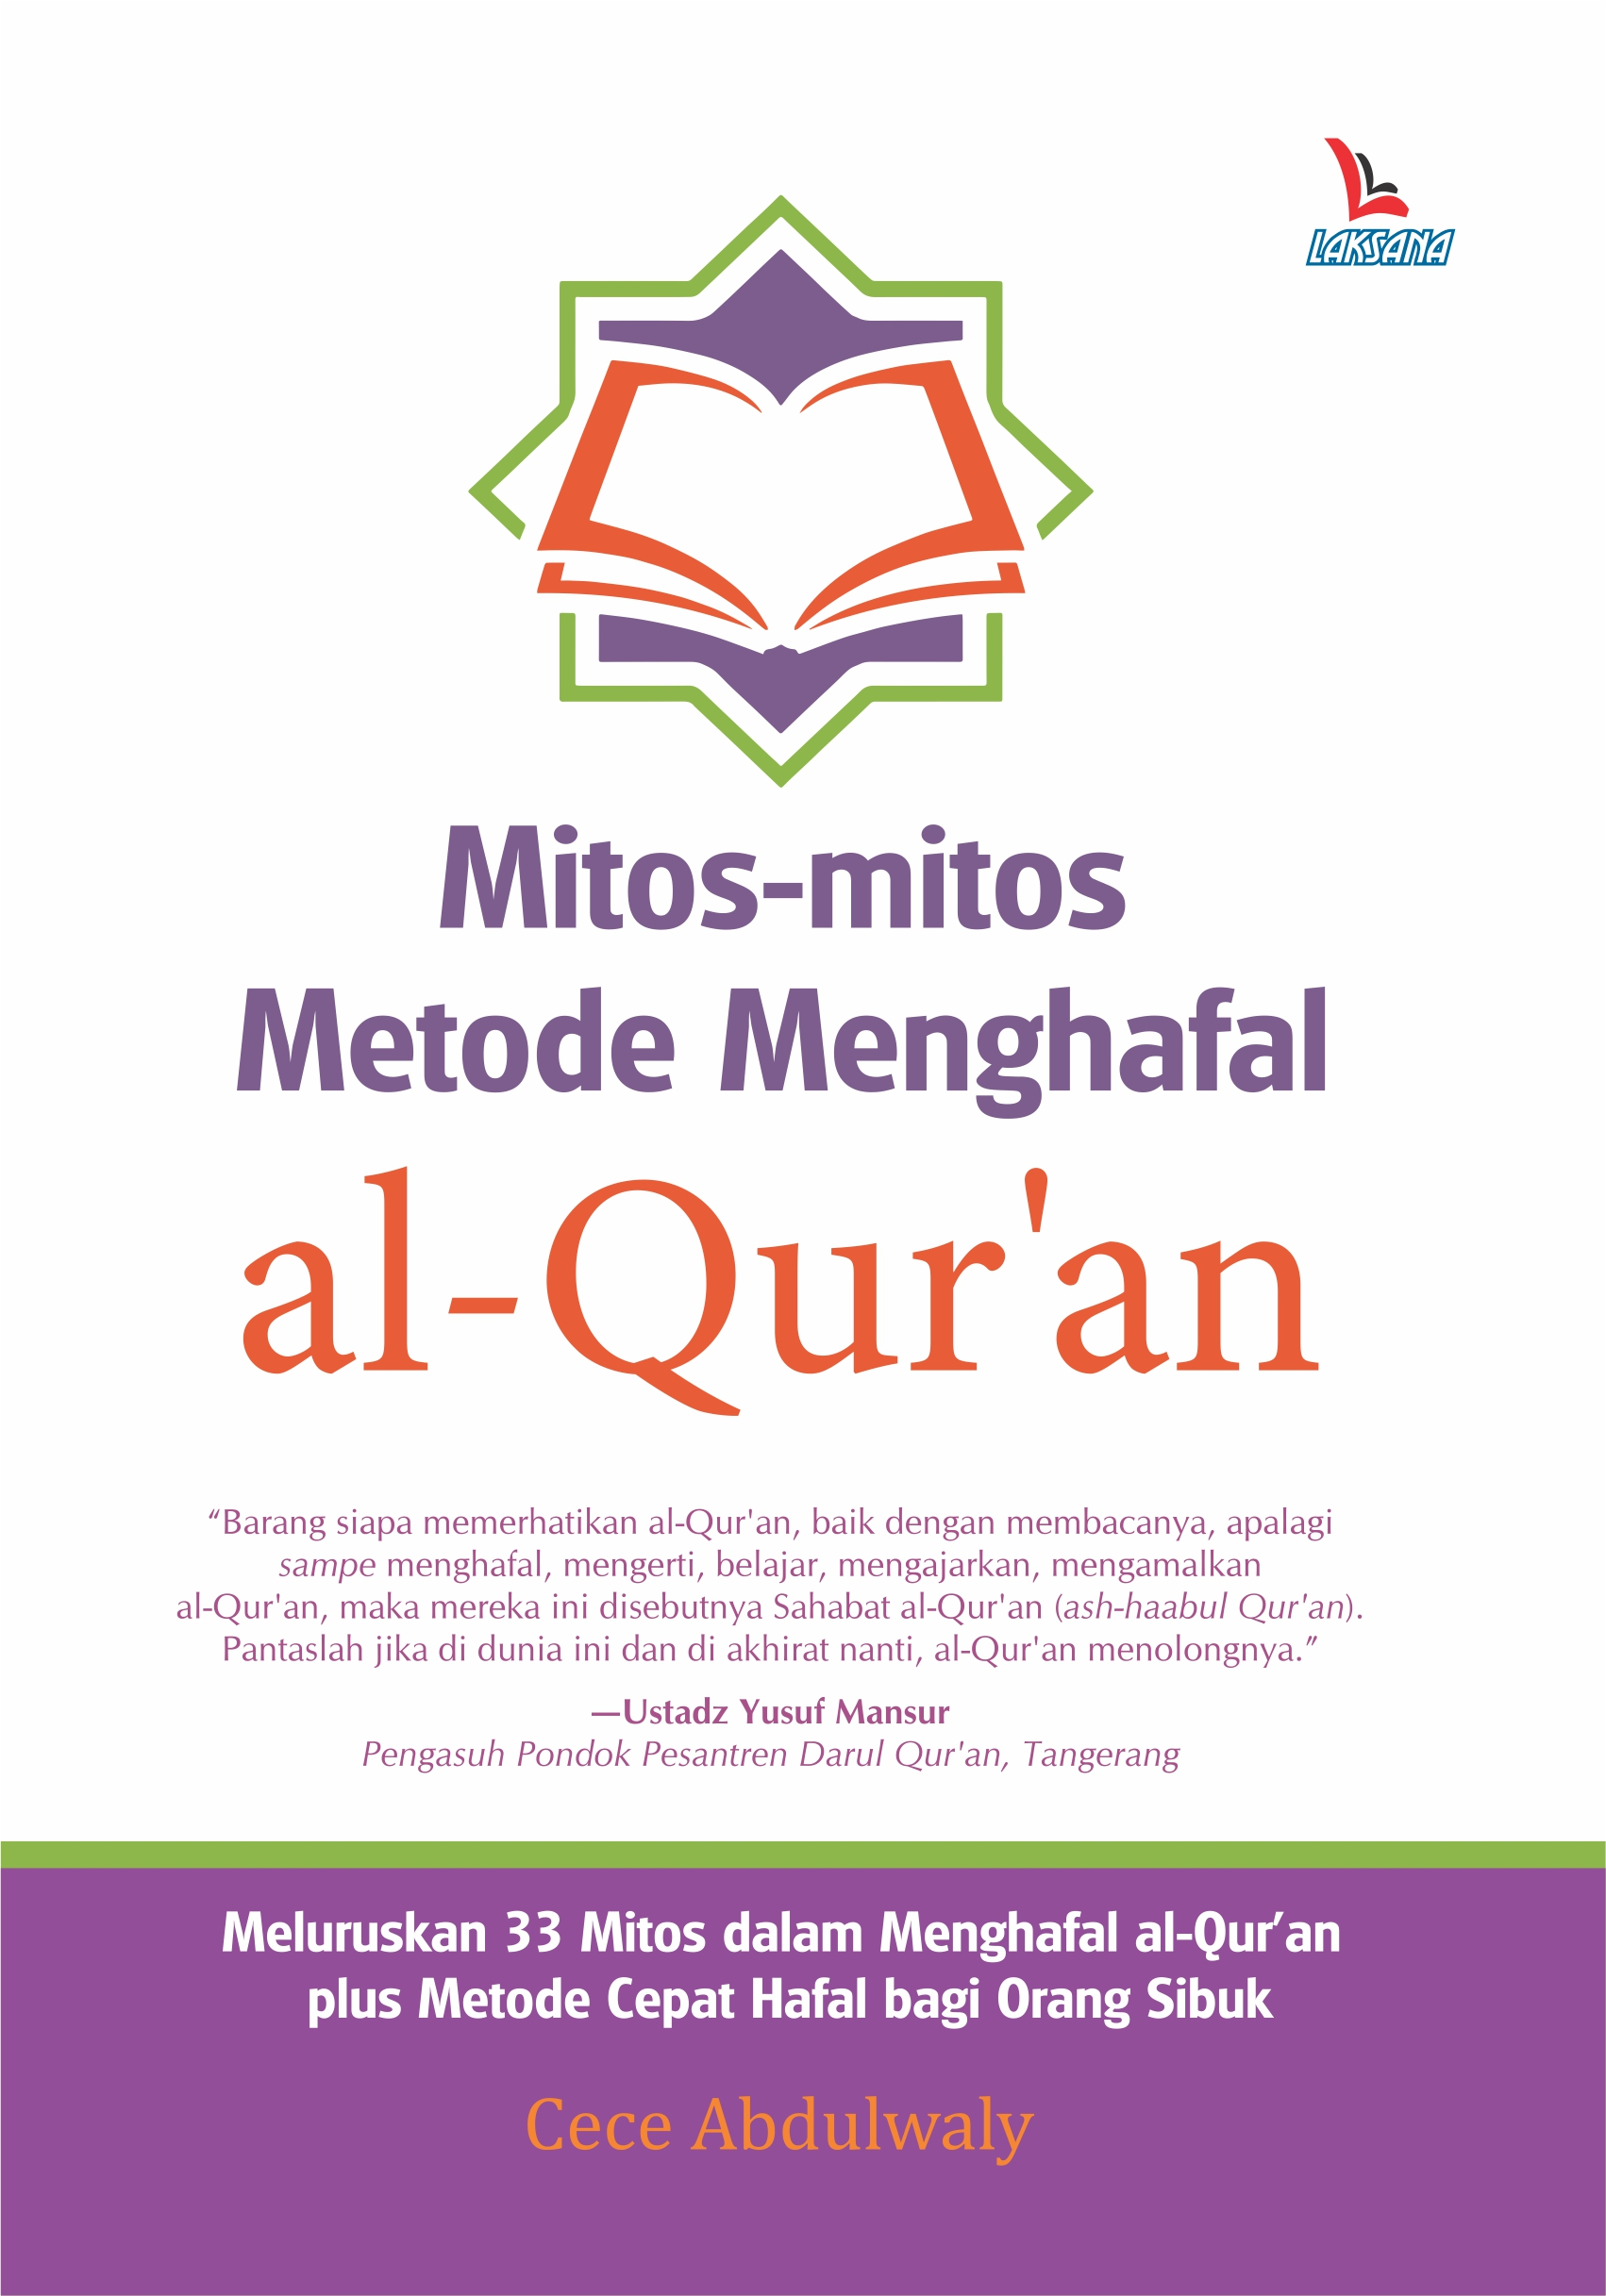 Mitos-mitos metode menghafal Al Quran [sumber elektronis]